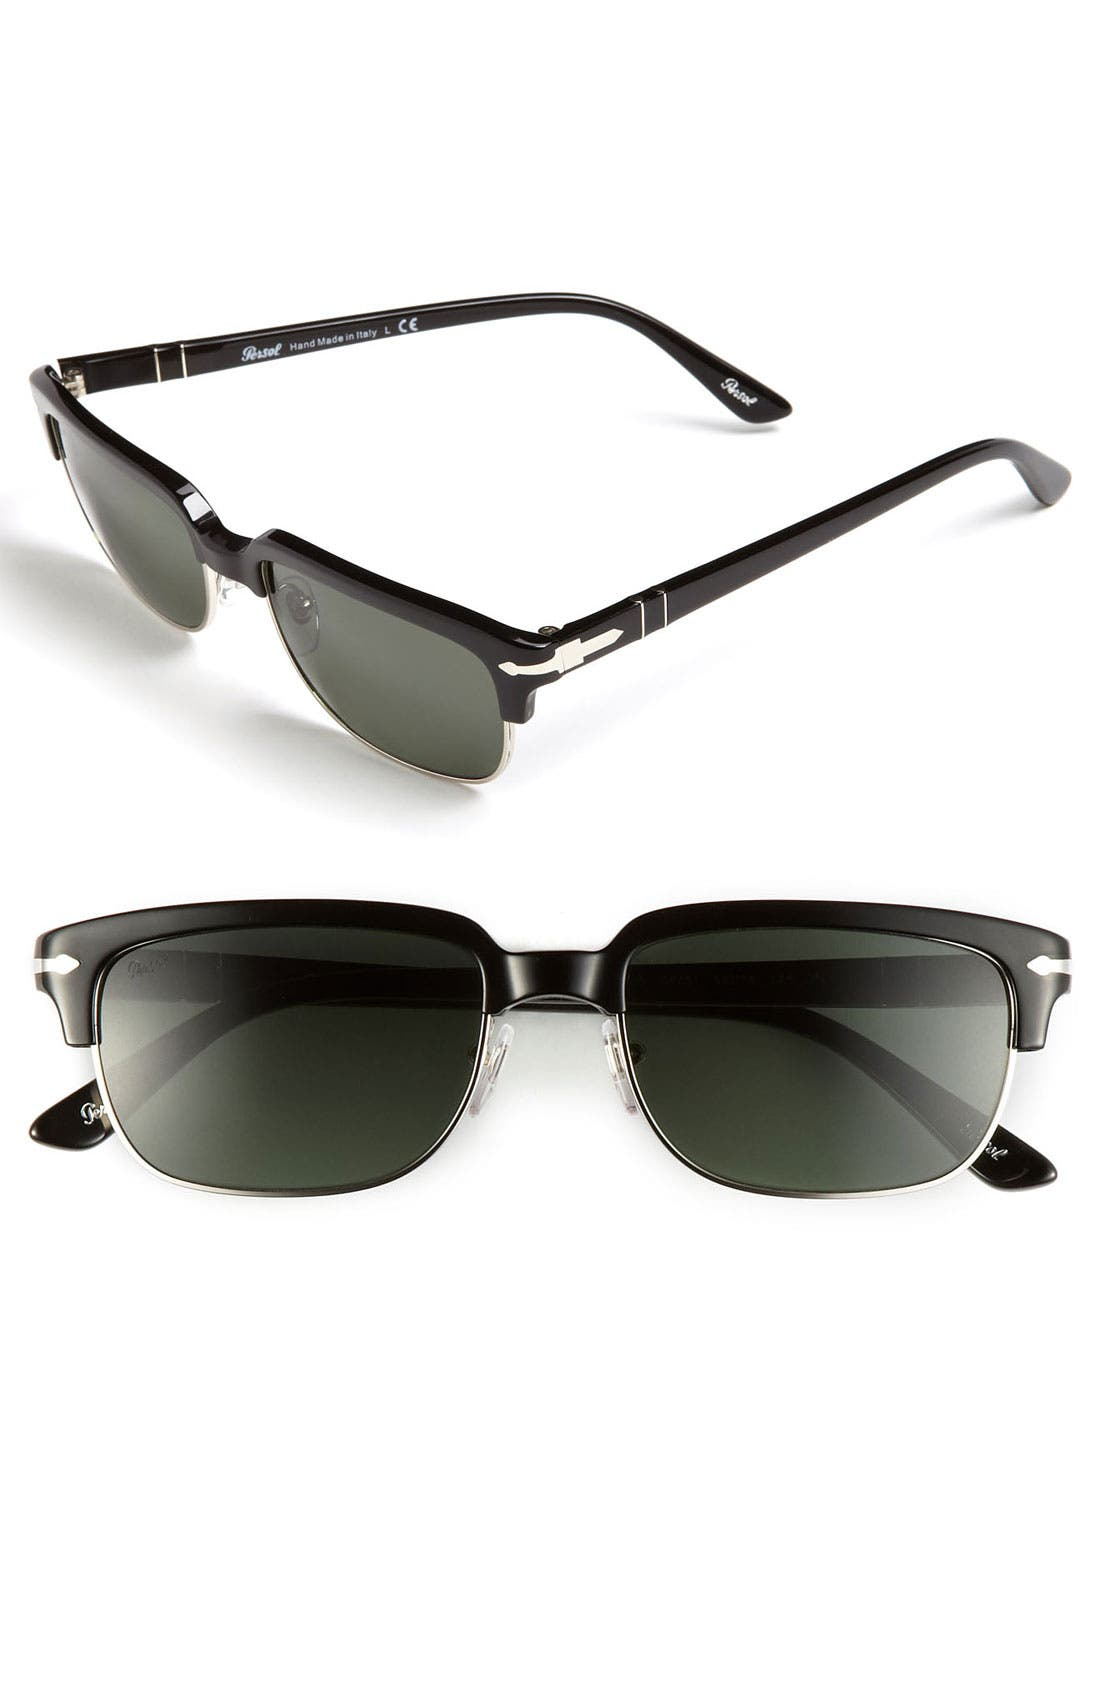 Alternate Image 1 Selected - Persol 'Suprema' 54mm Sunglasses